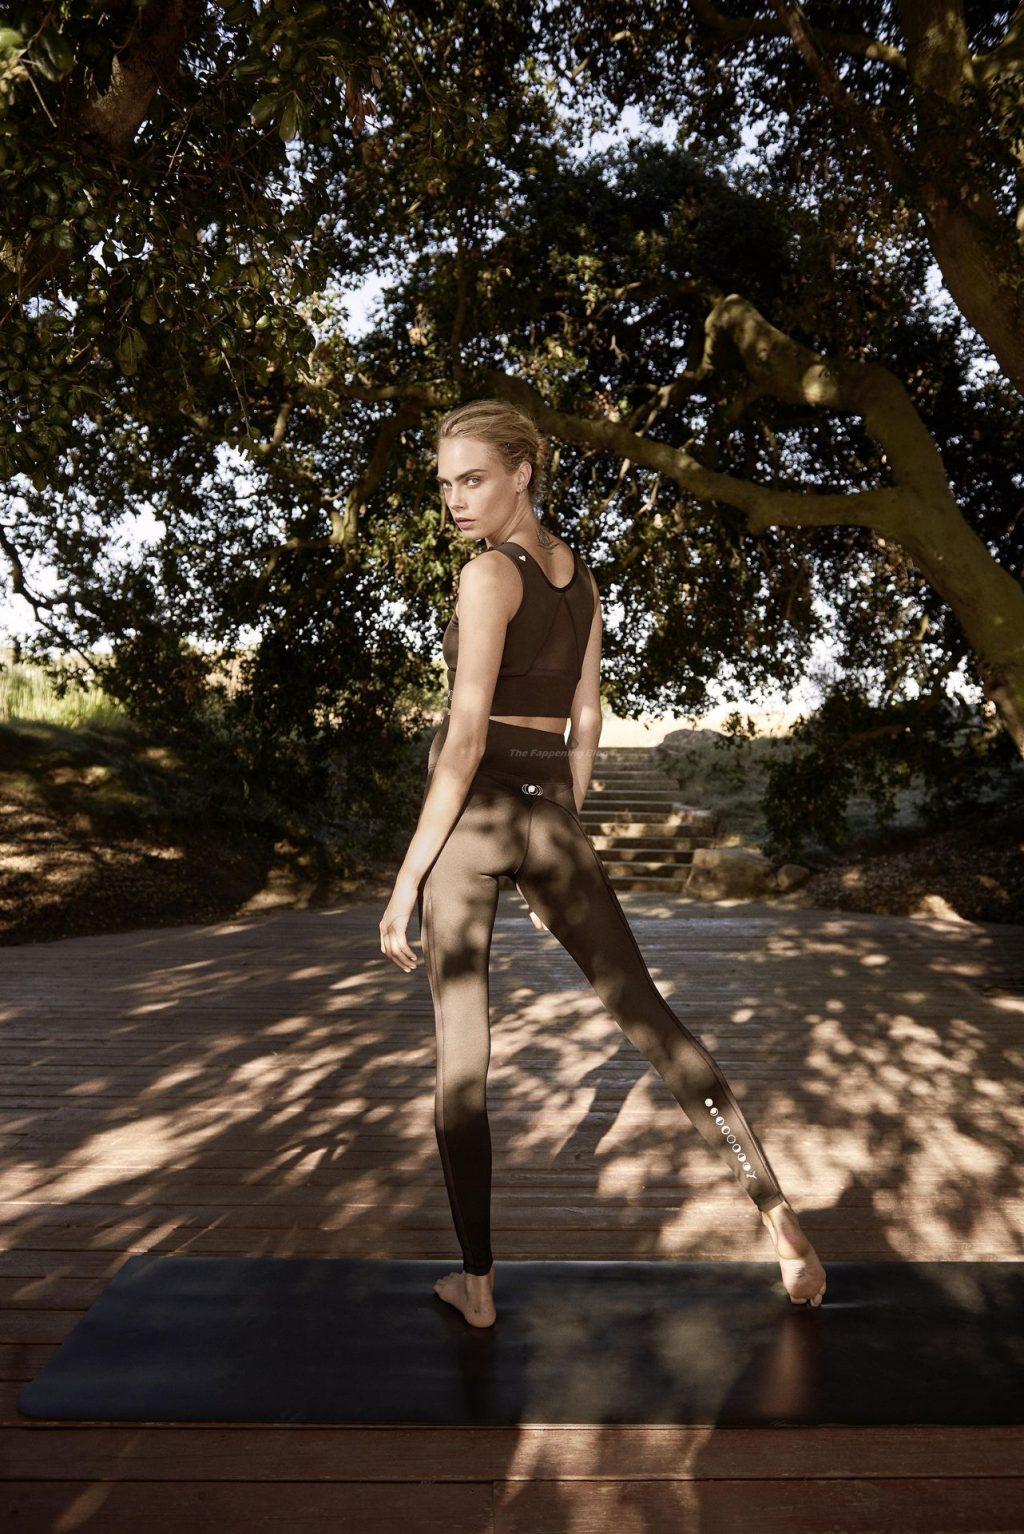 Cara Delevingne Presents a New Puma Yoga Collection (10 Photos)